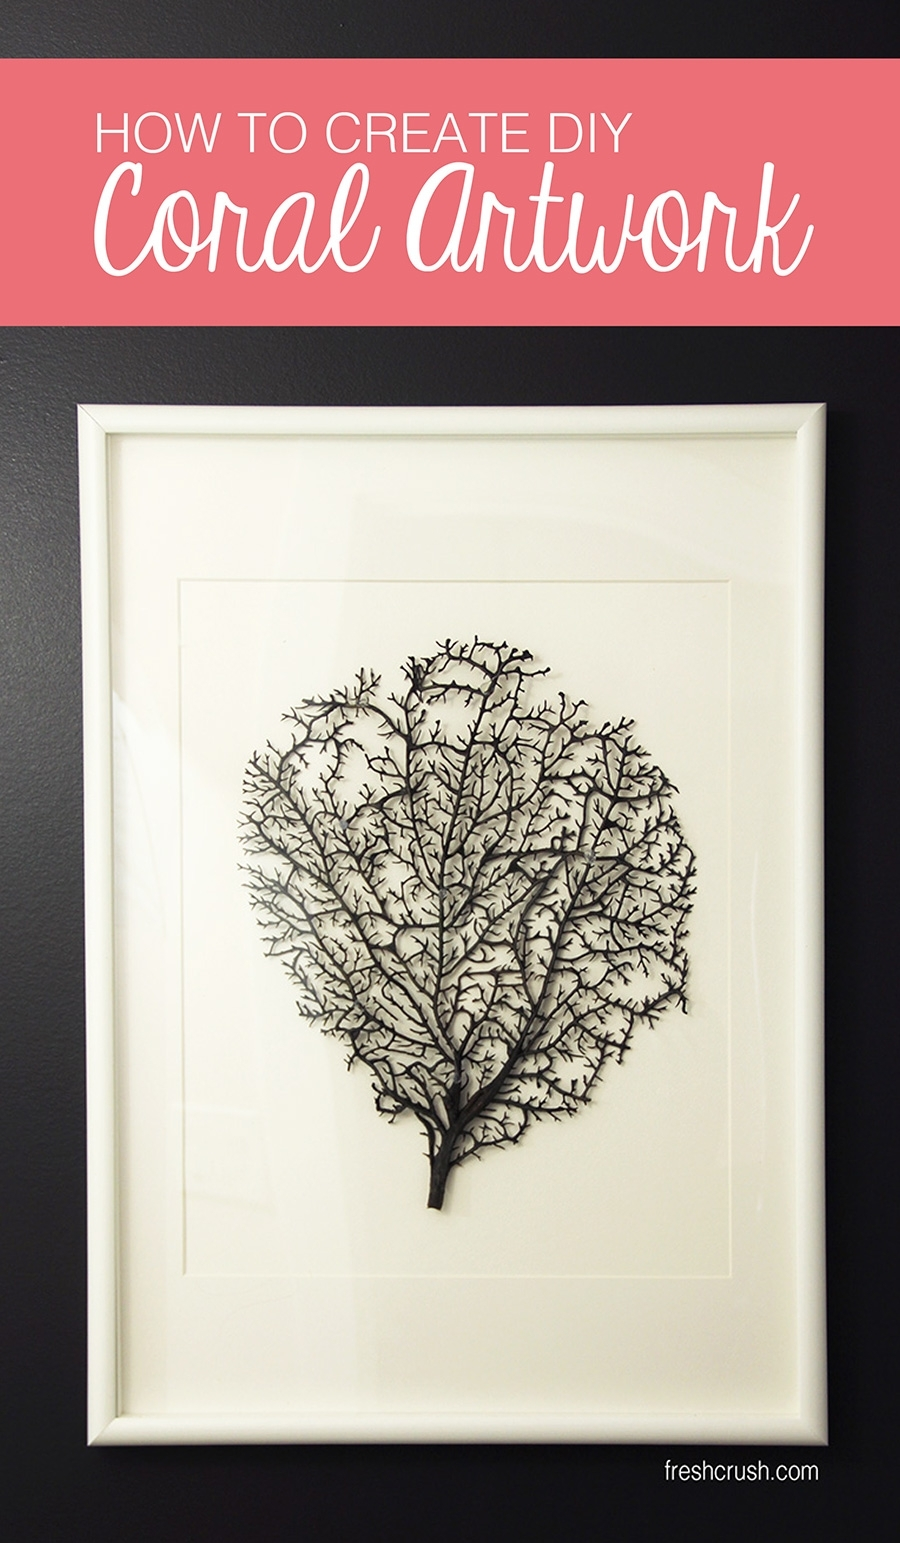 Diy Coral Artwork - One Room Challenge - Week 4 - Fresh Crush throughout Latest Framed Coral Art Prints